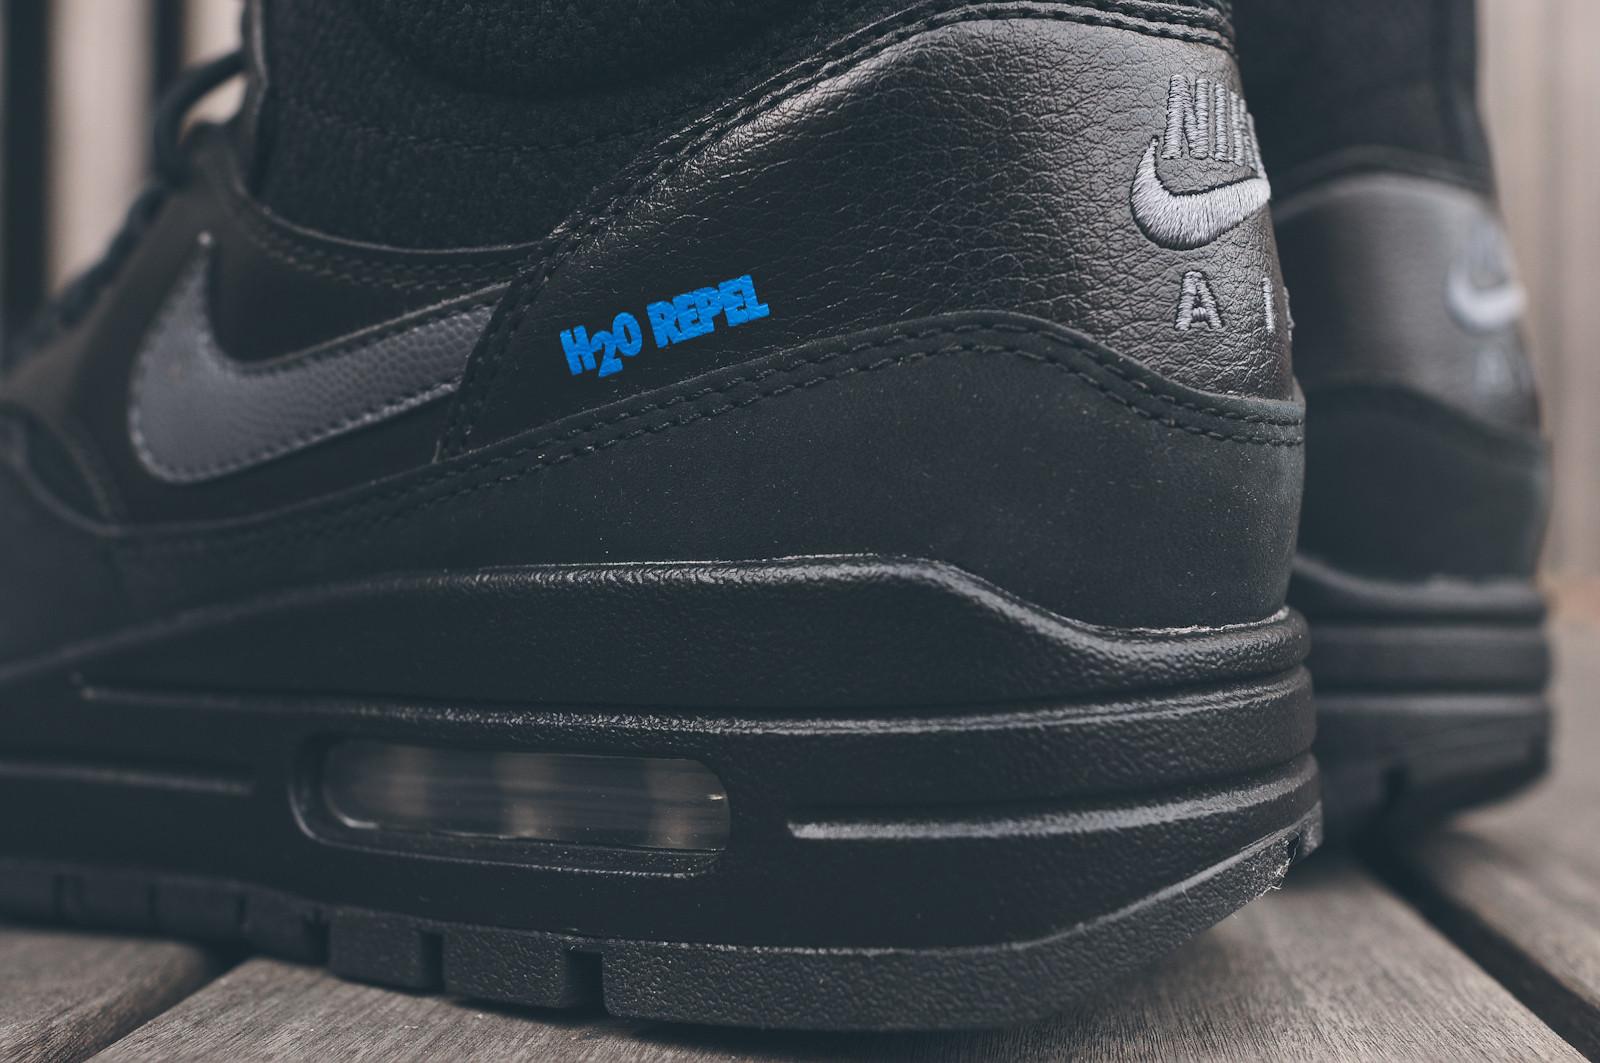 timeless design 70349 9fa90 KICKS: THE NEW #Nike Air Max 1 Sneakerboot is Water Repellant ...